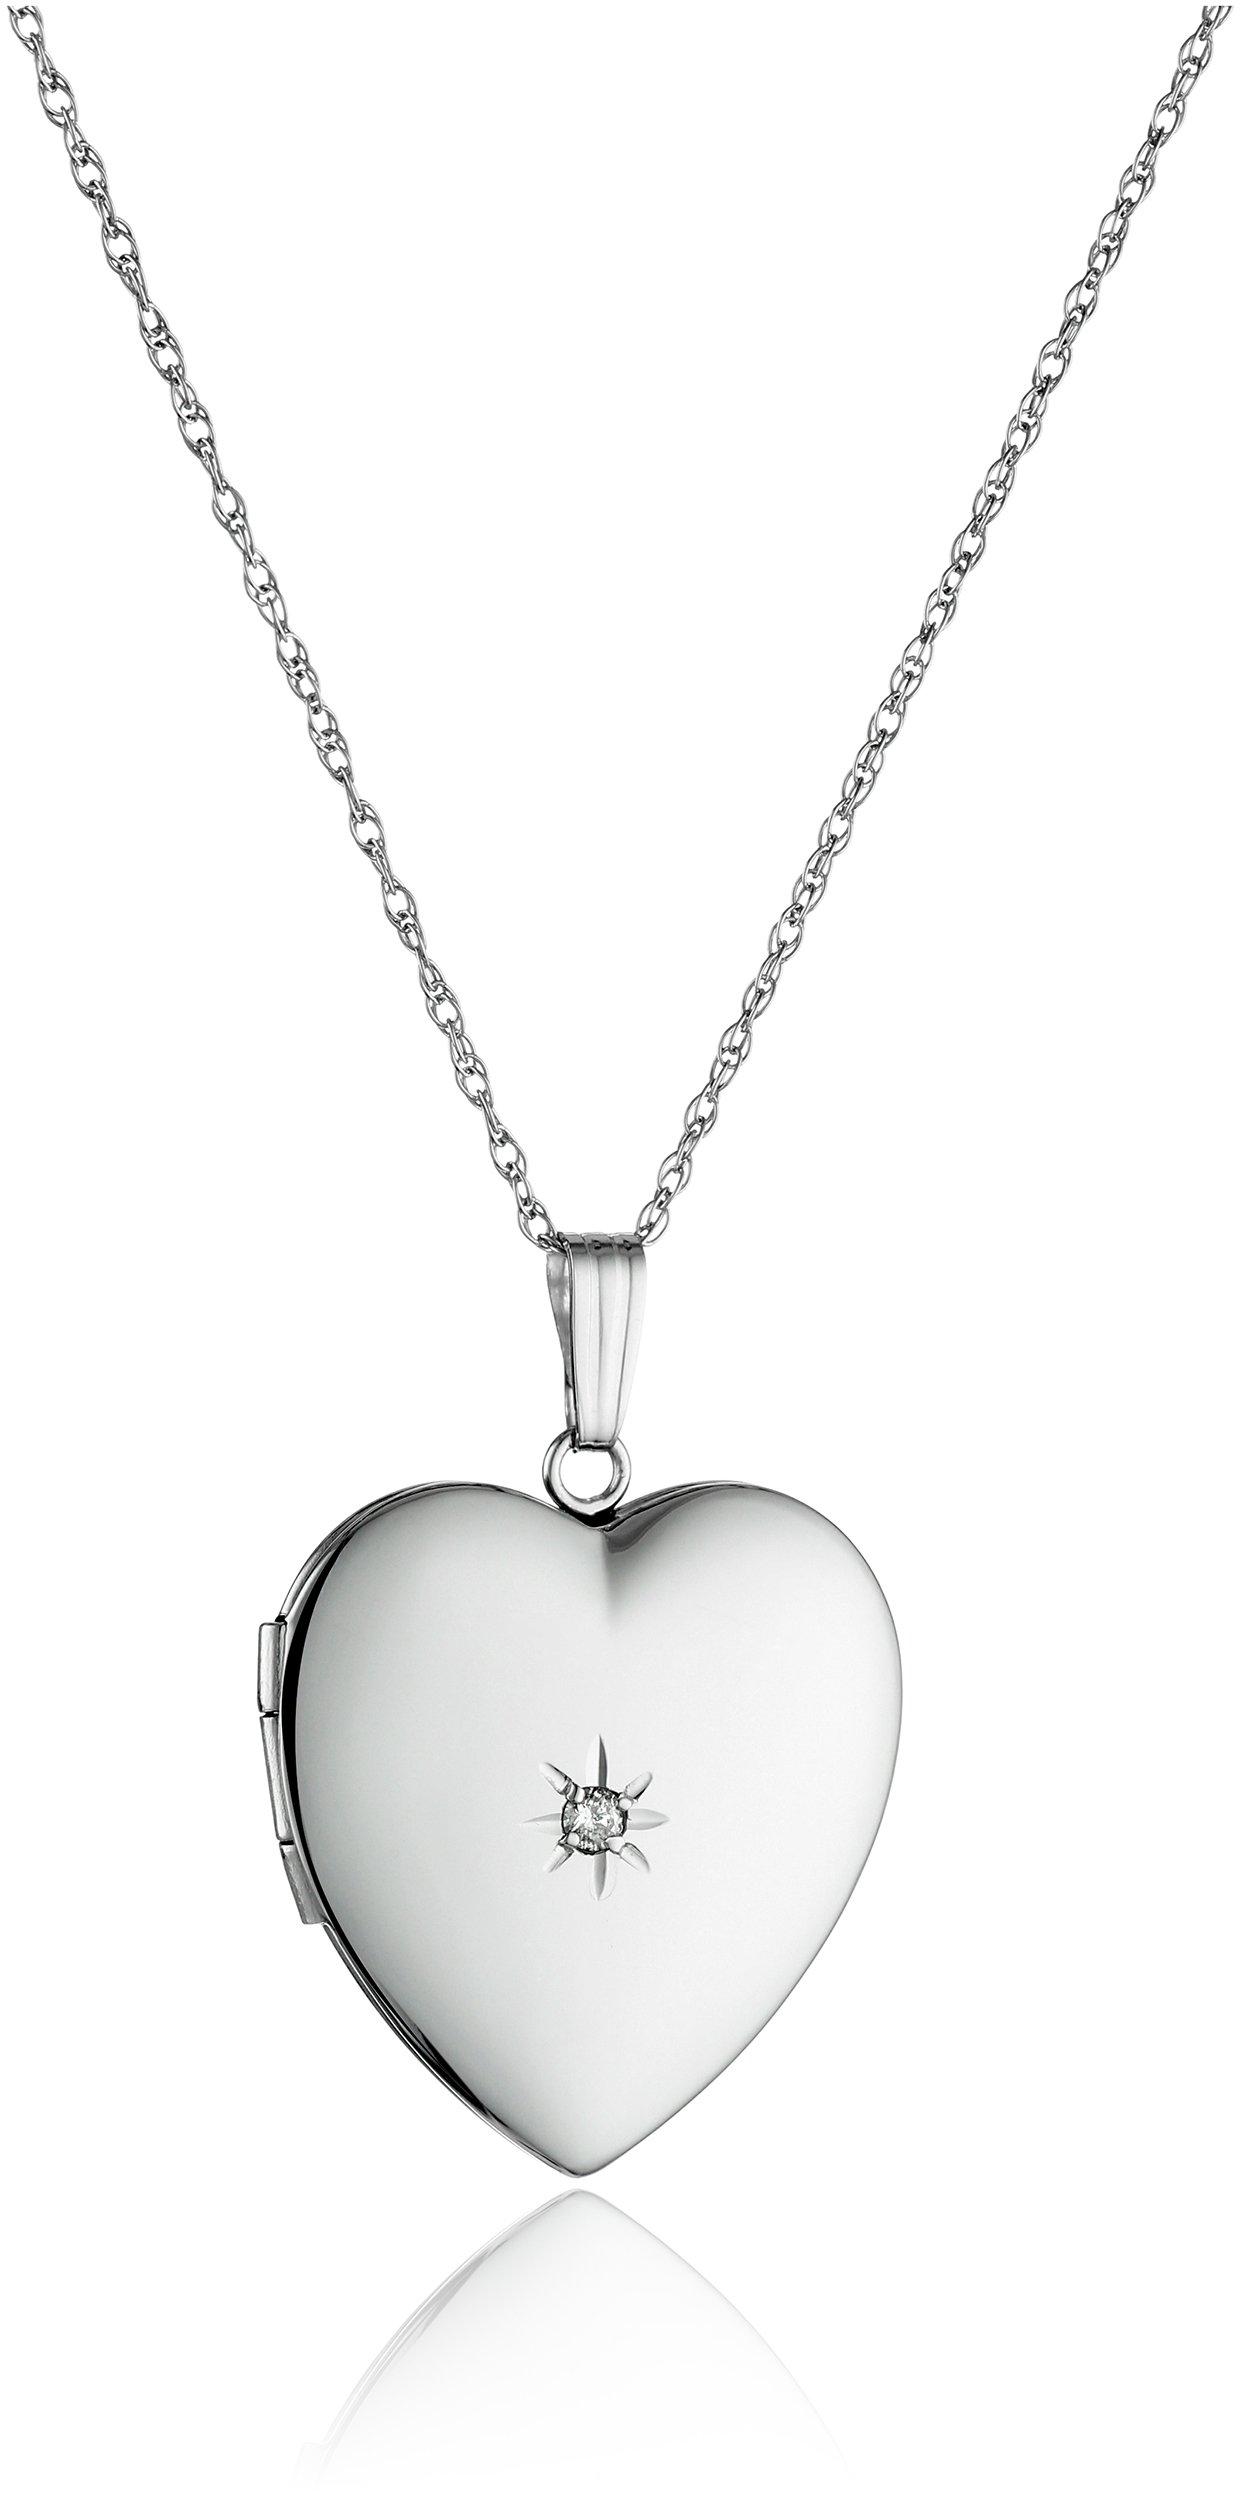 14k White Gold Diamond-Accent Heart Locket, 20''